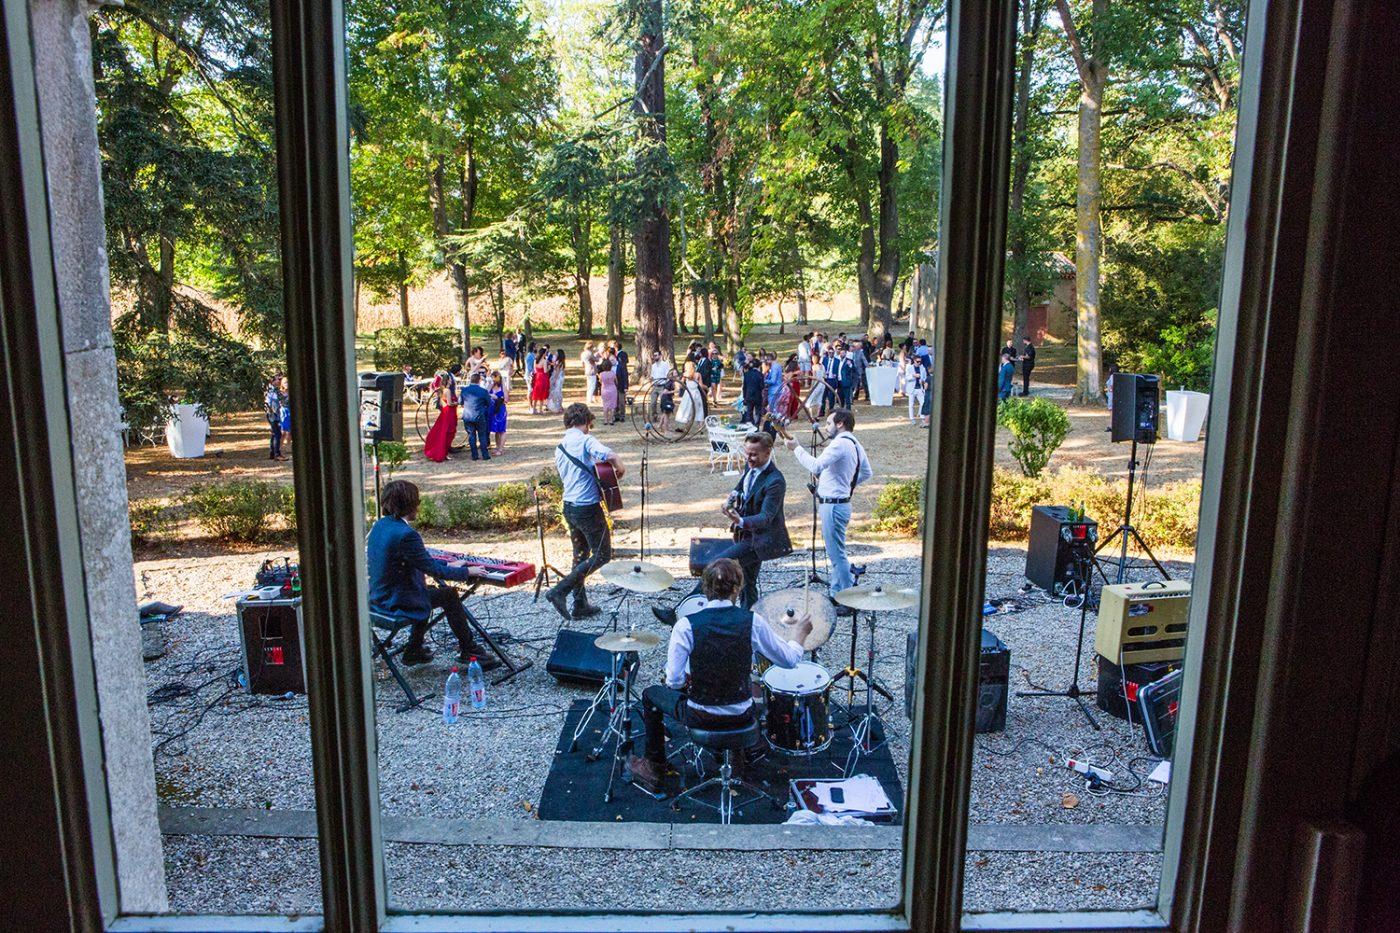 Concert lors du vin d'honneur / Rock band during the wine of honor